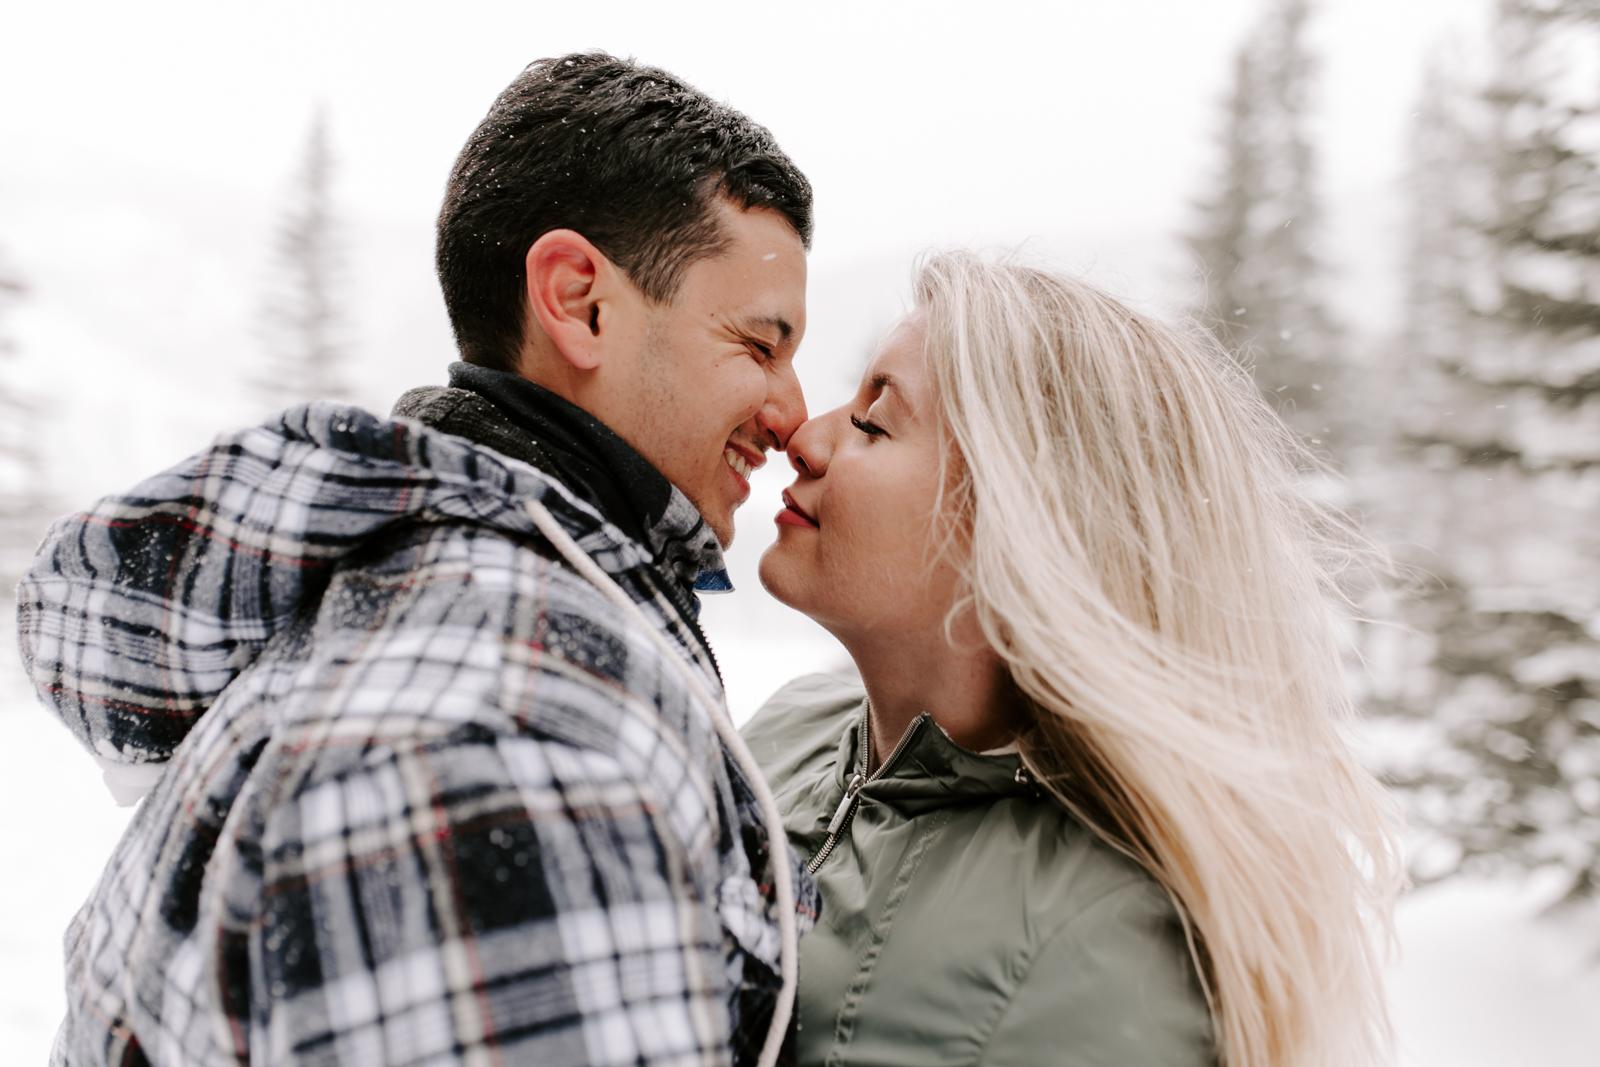 Vanessa & Danny Snow Rocky Mountain National Park Engagement Elopement Photography Photographer-118.jpg